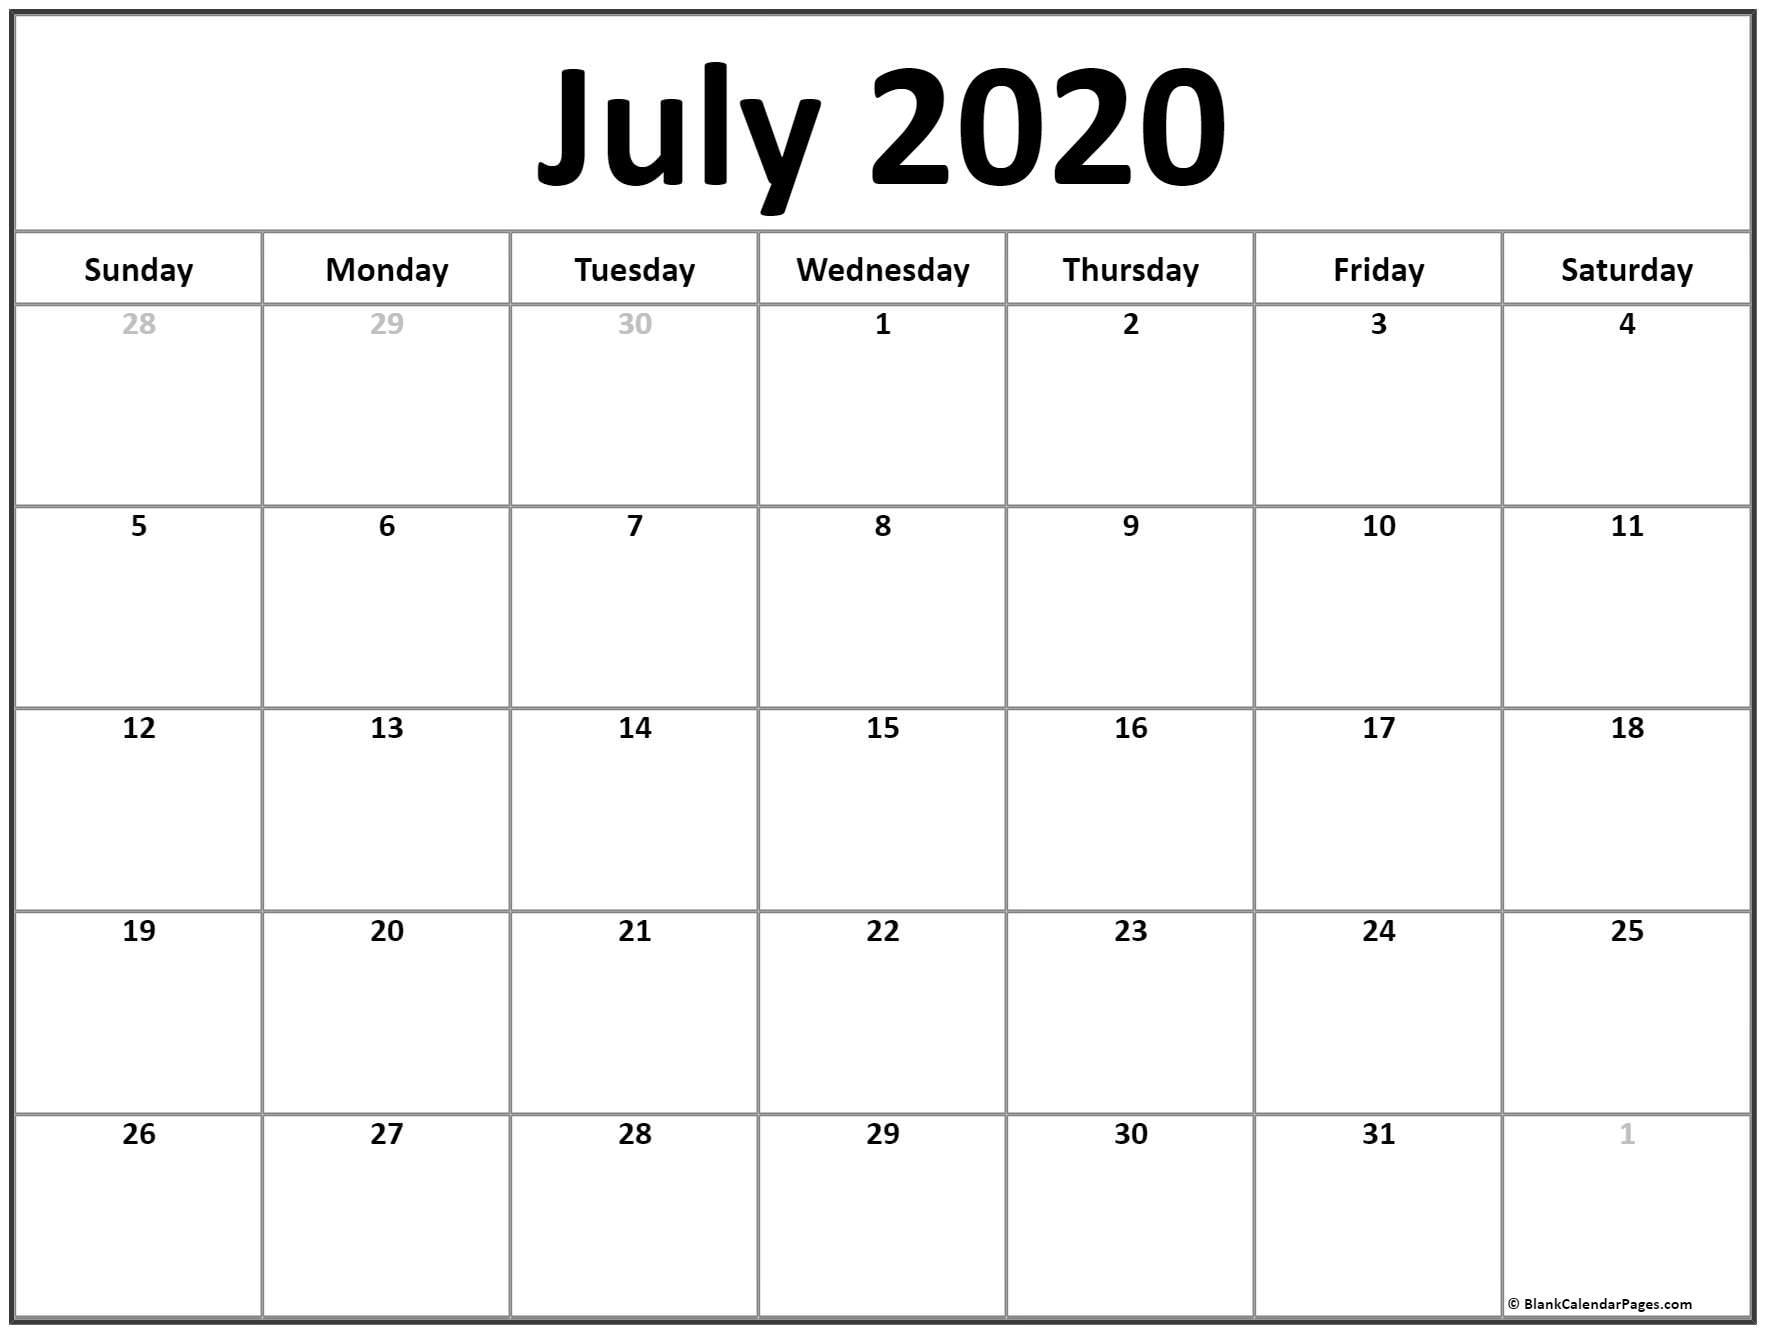 July 2020 Calendar | Free Printable Monthly Calendars with regard to Free Blank Printable Monthly Calendar 2020